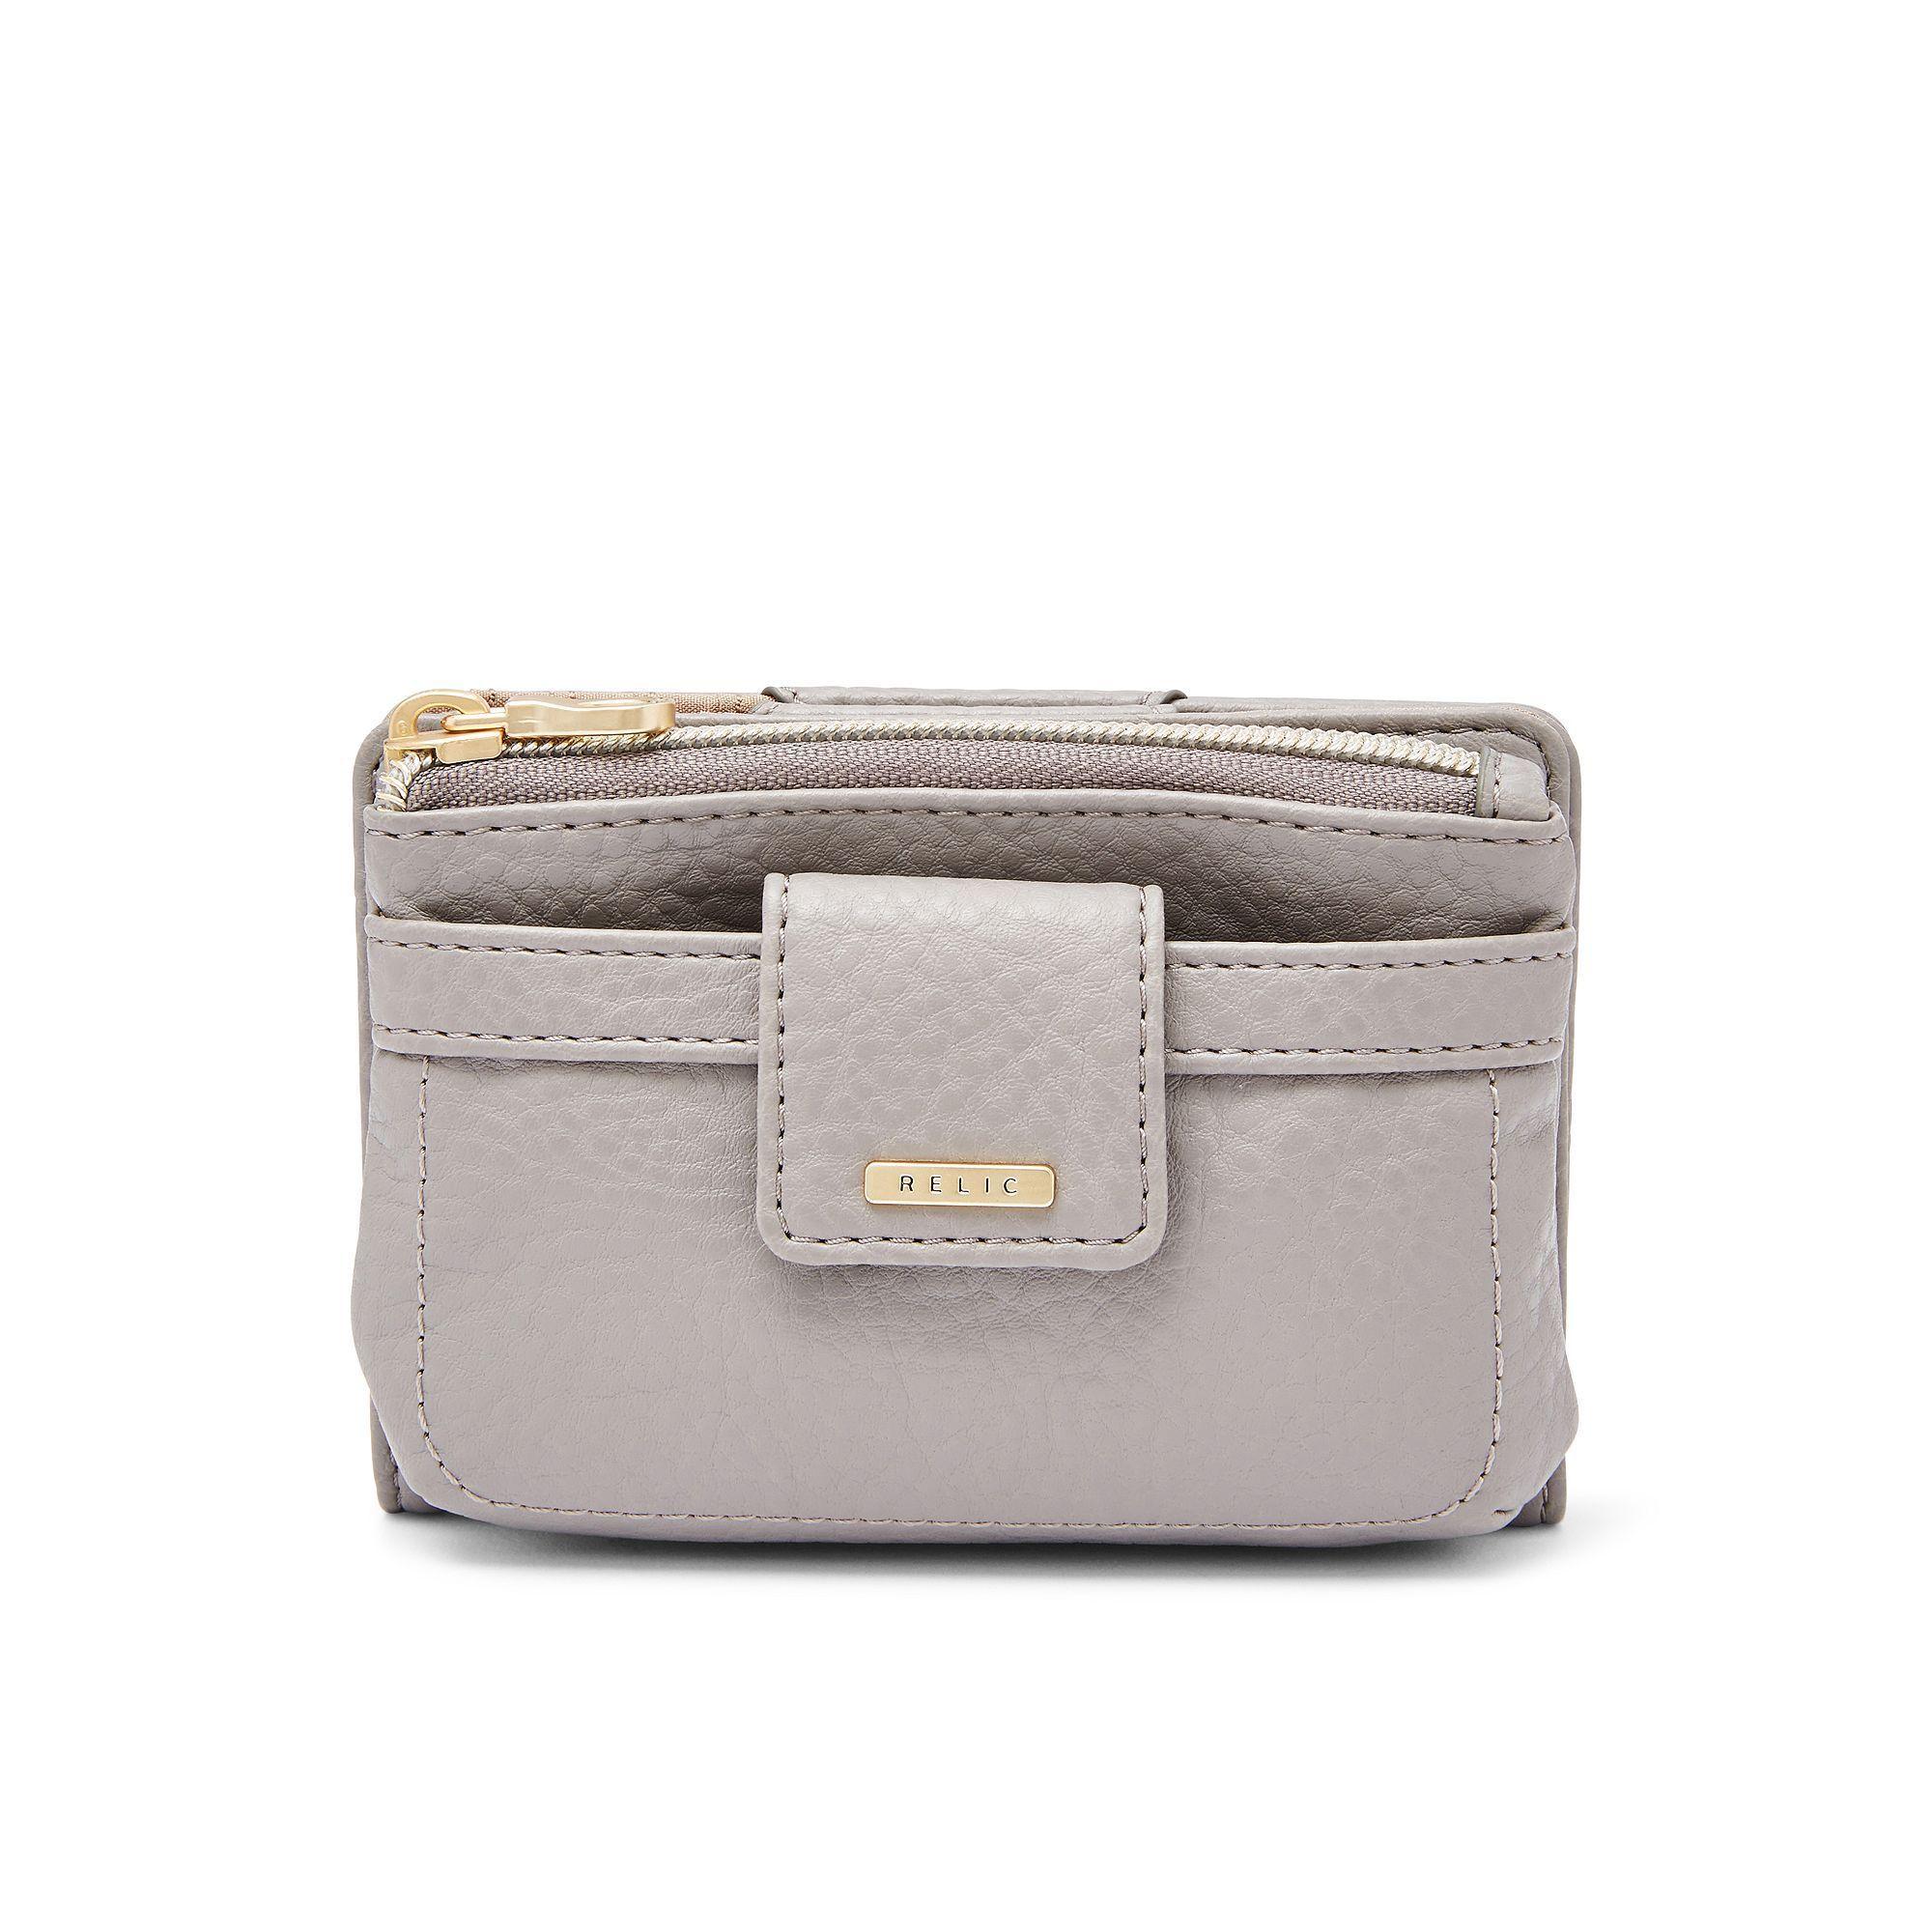 Relic Kenna Multifunction Wallet, Women's, Yellow Oth